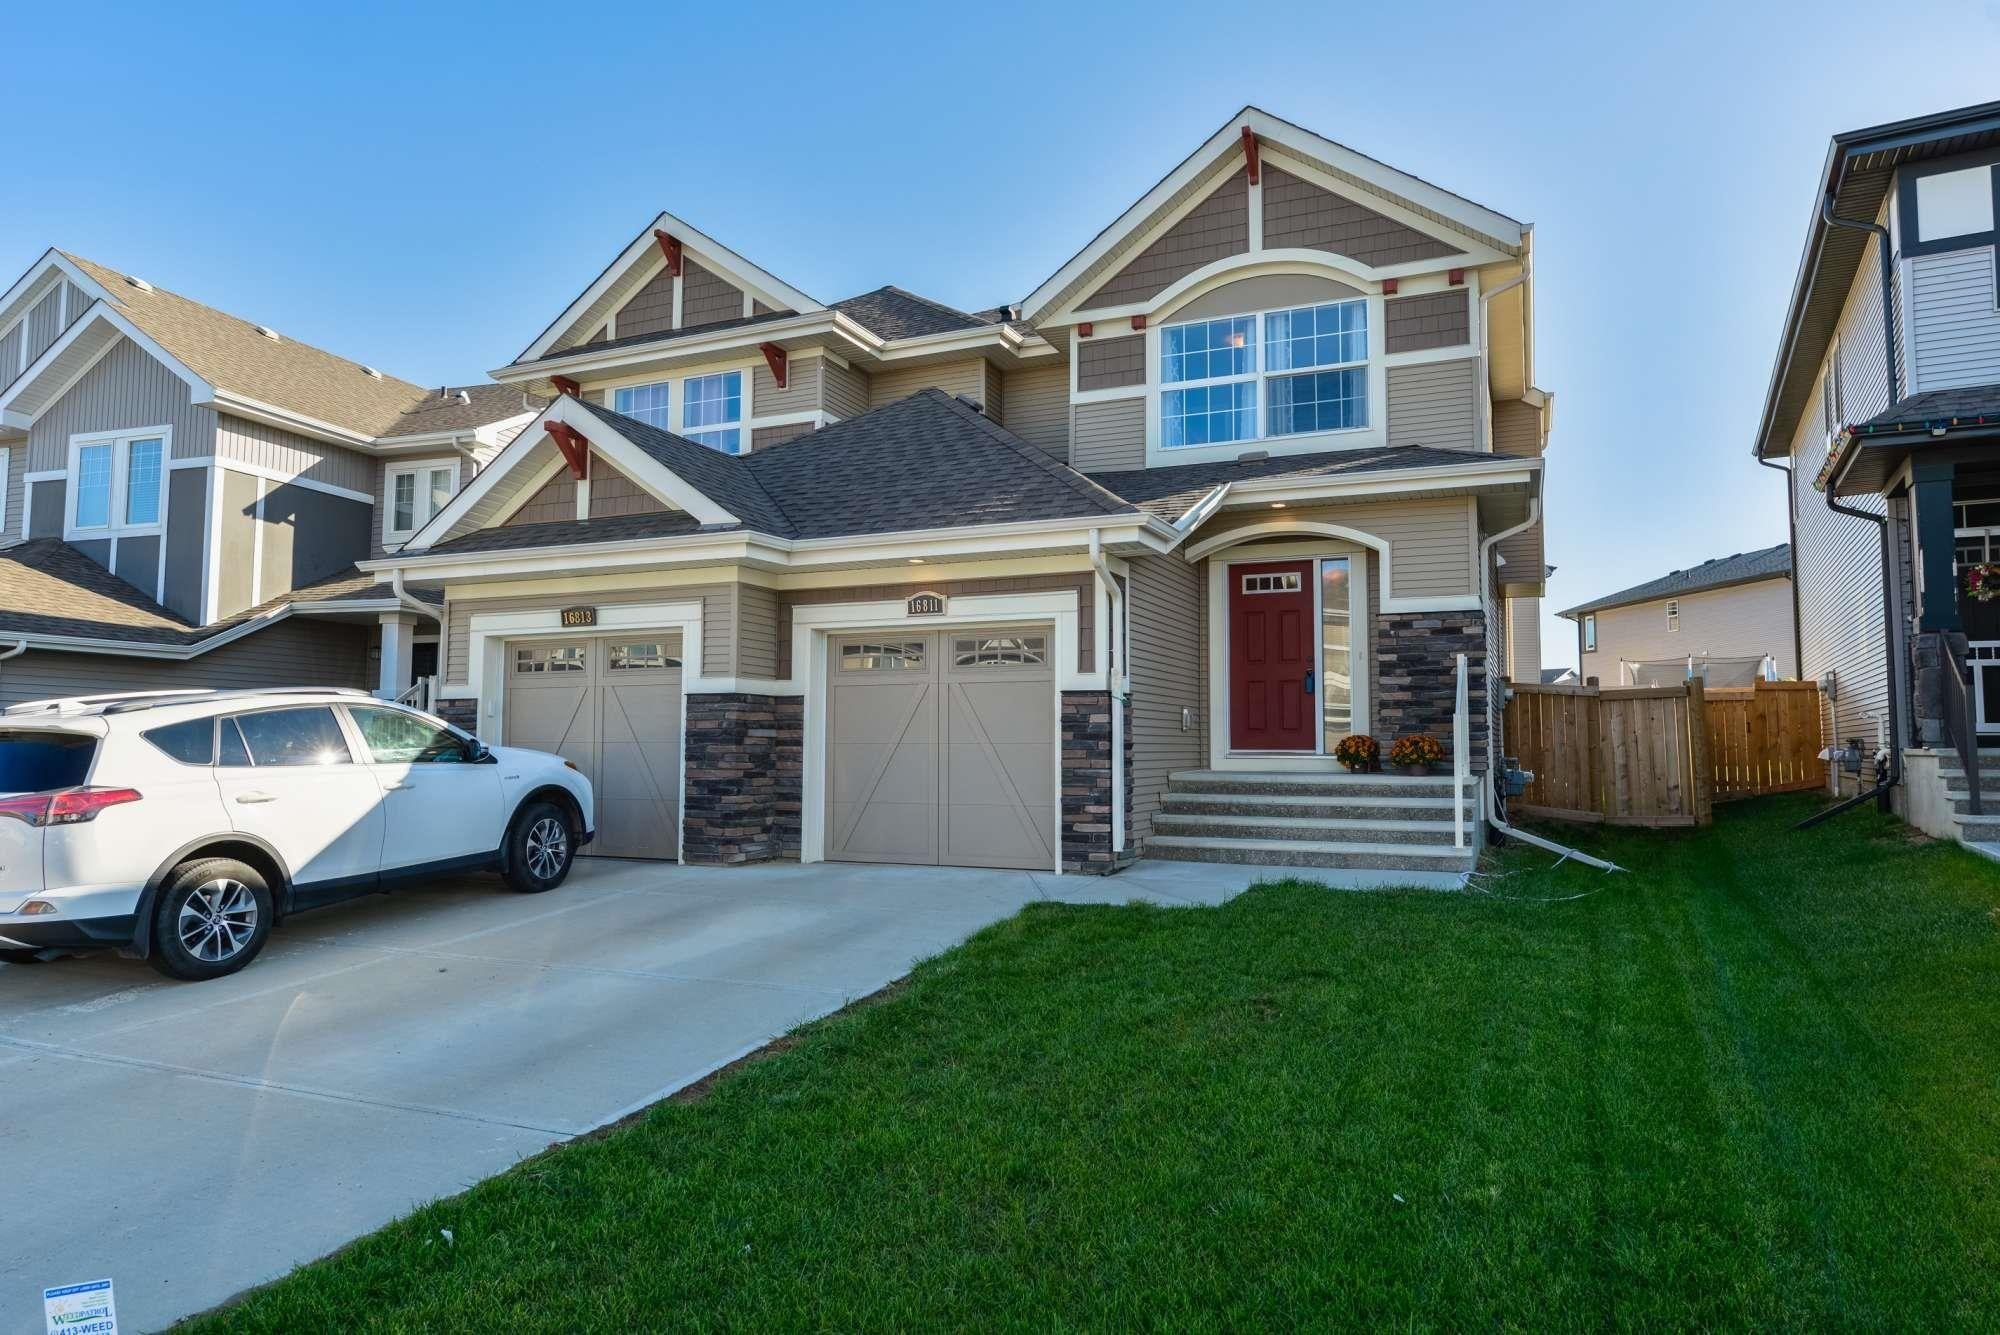 Main Photo: 16811 64 Street in Edmonton: Zone 03 House Half Duplex for sale : MLS®# E4264177